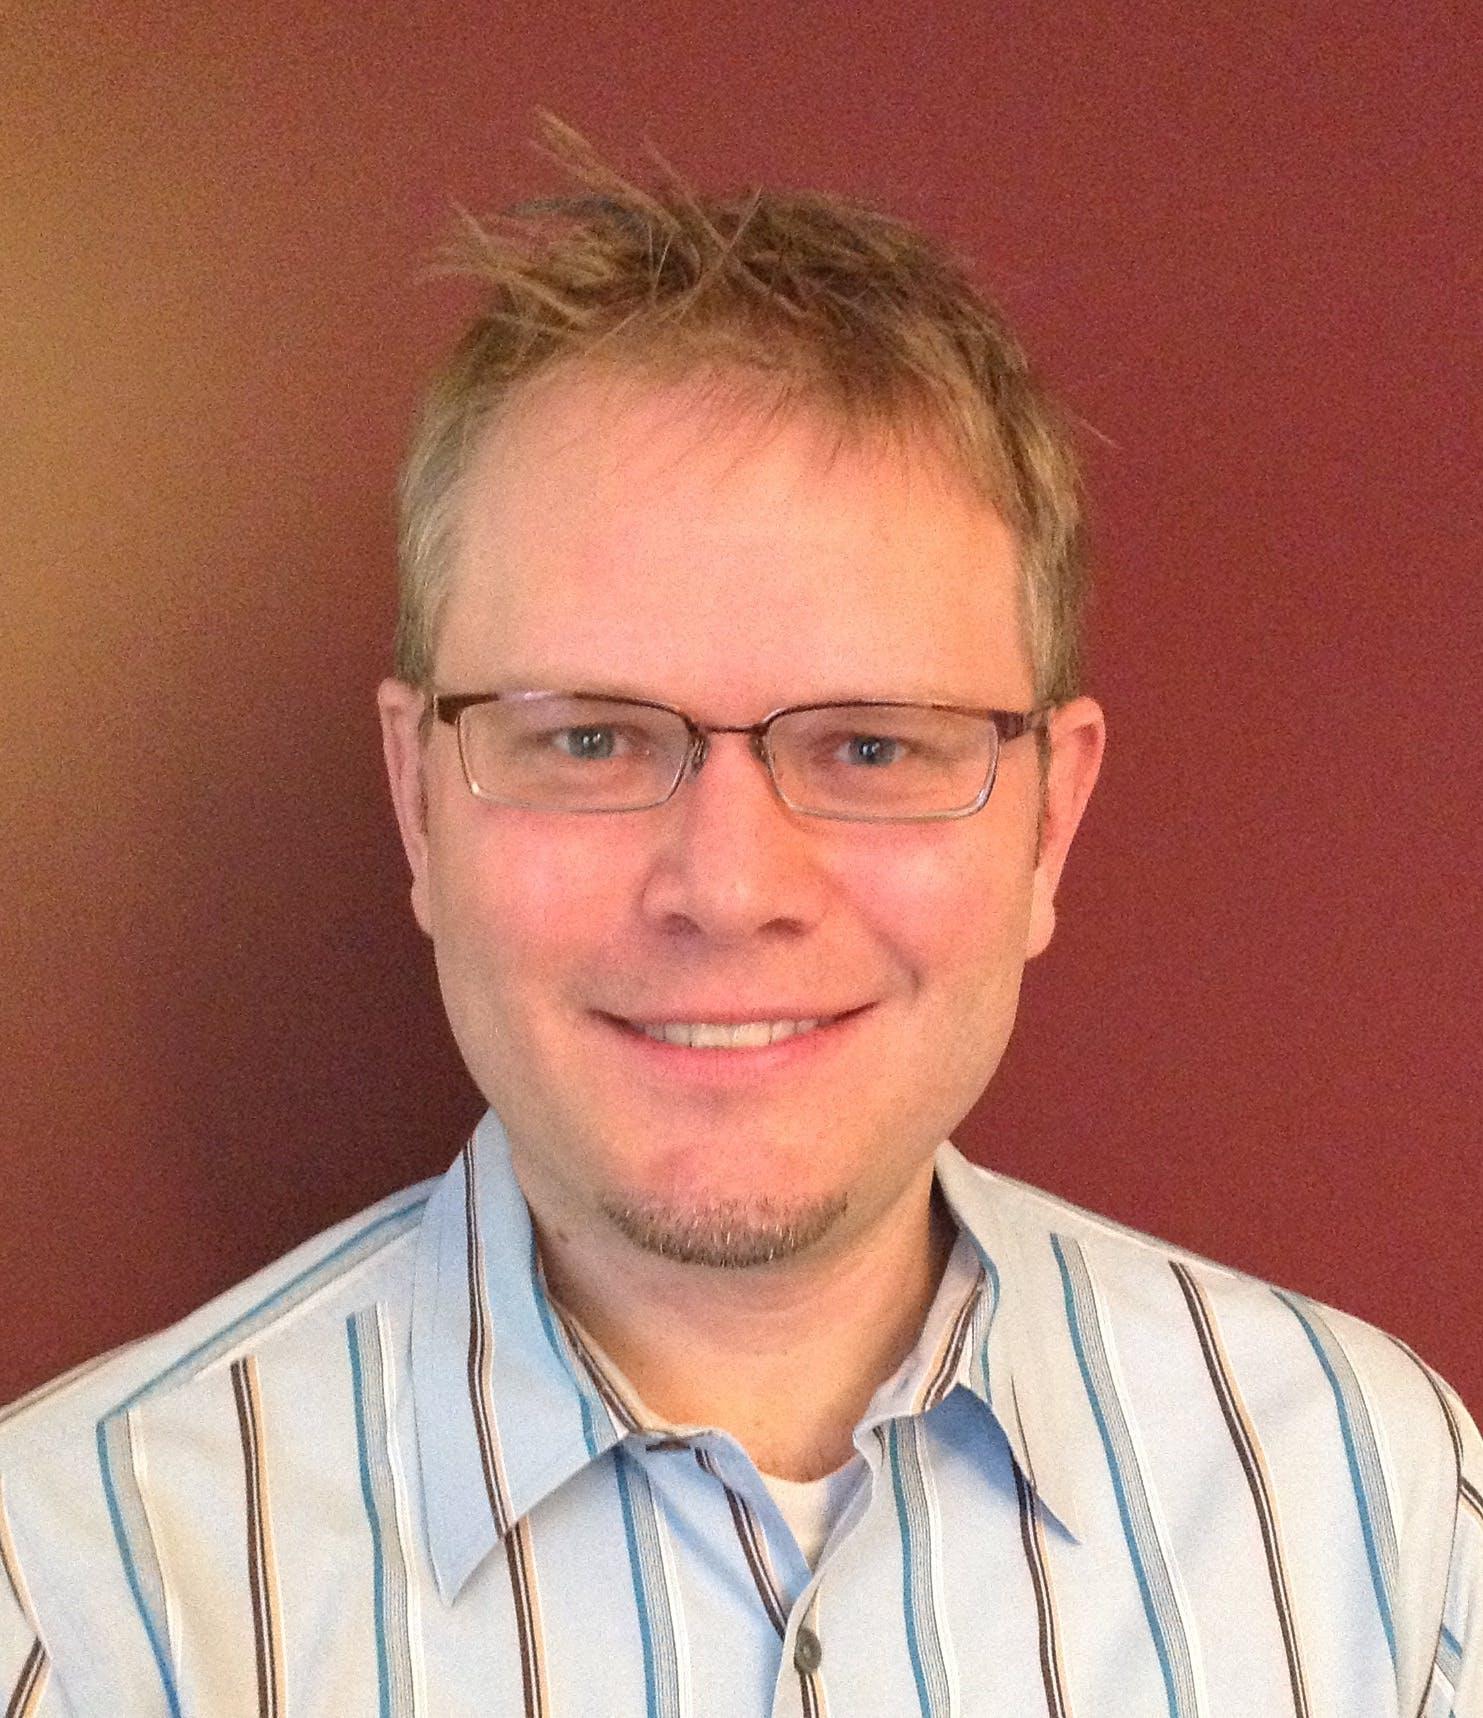 Martin Lindquist, PhD, MSc